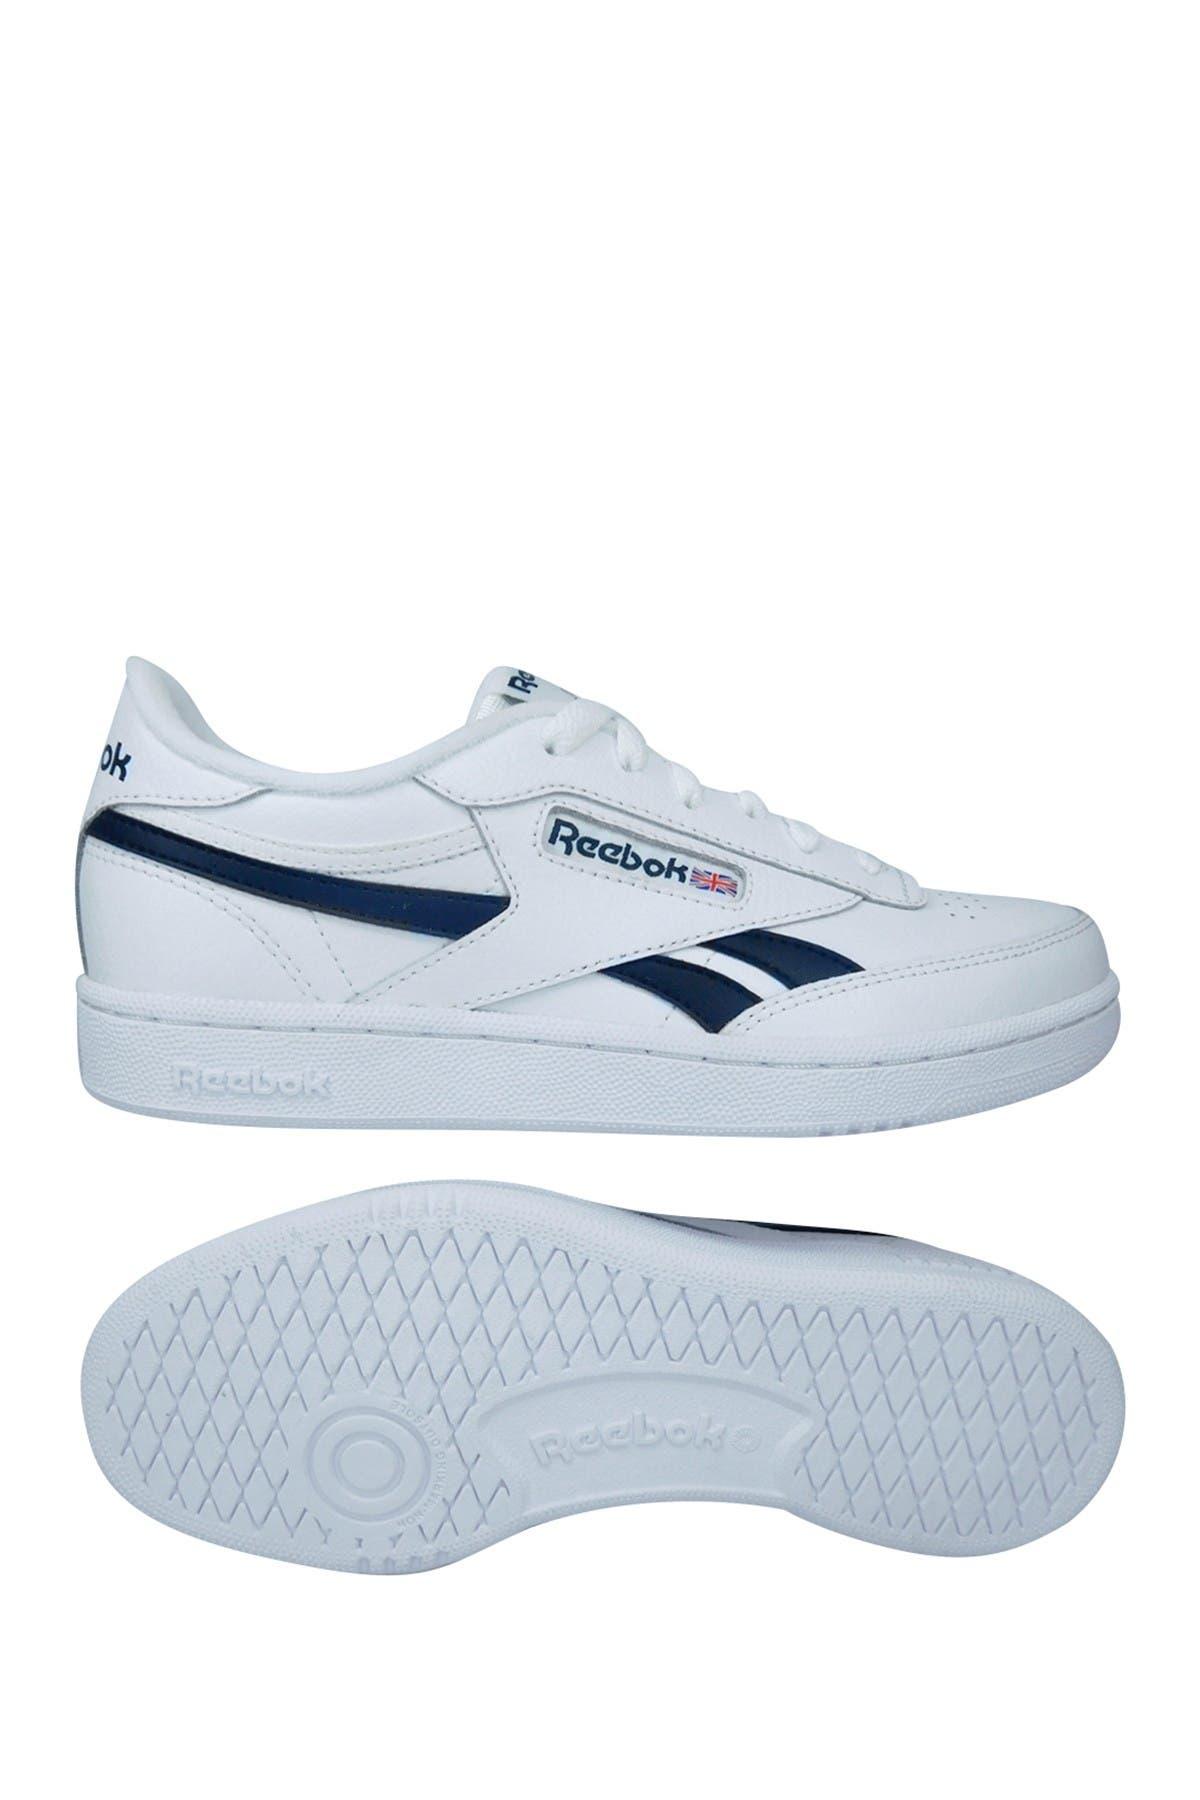 Reebok | Club C Revenge Sneaker